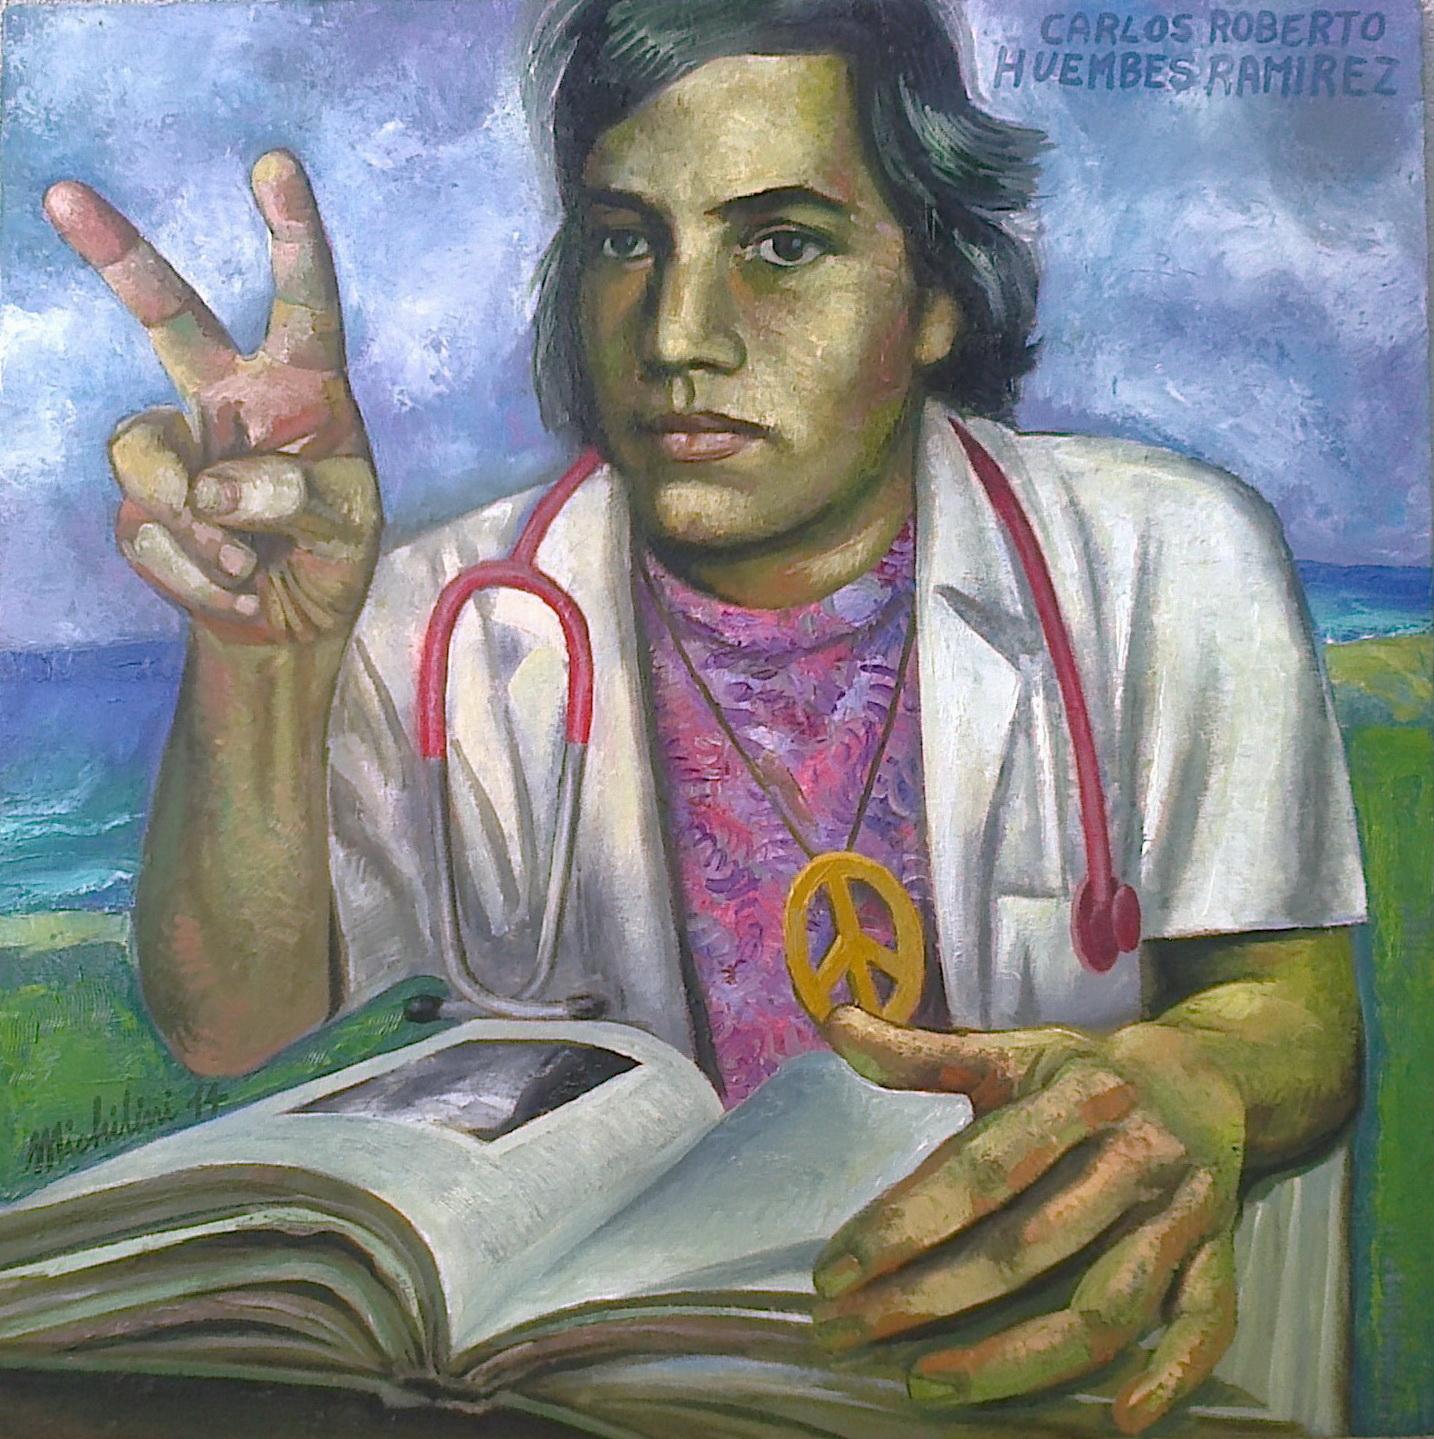 Sergio Michilini, RETRATO DE CARLOS ROBERTO HUEMBES RAMIREZ, 2014, óleo sobre tela, cm.70x70